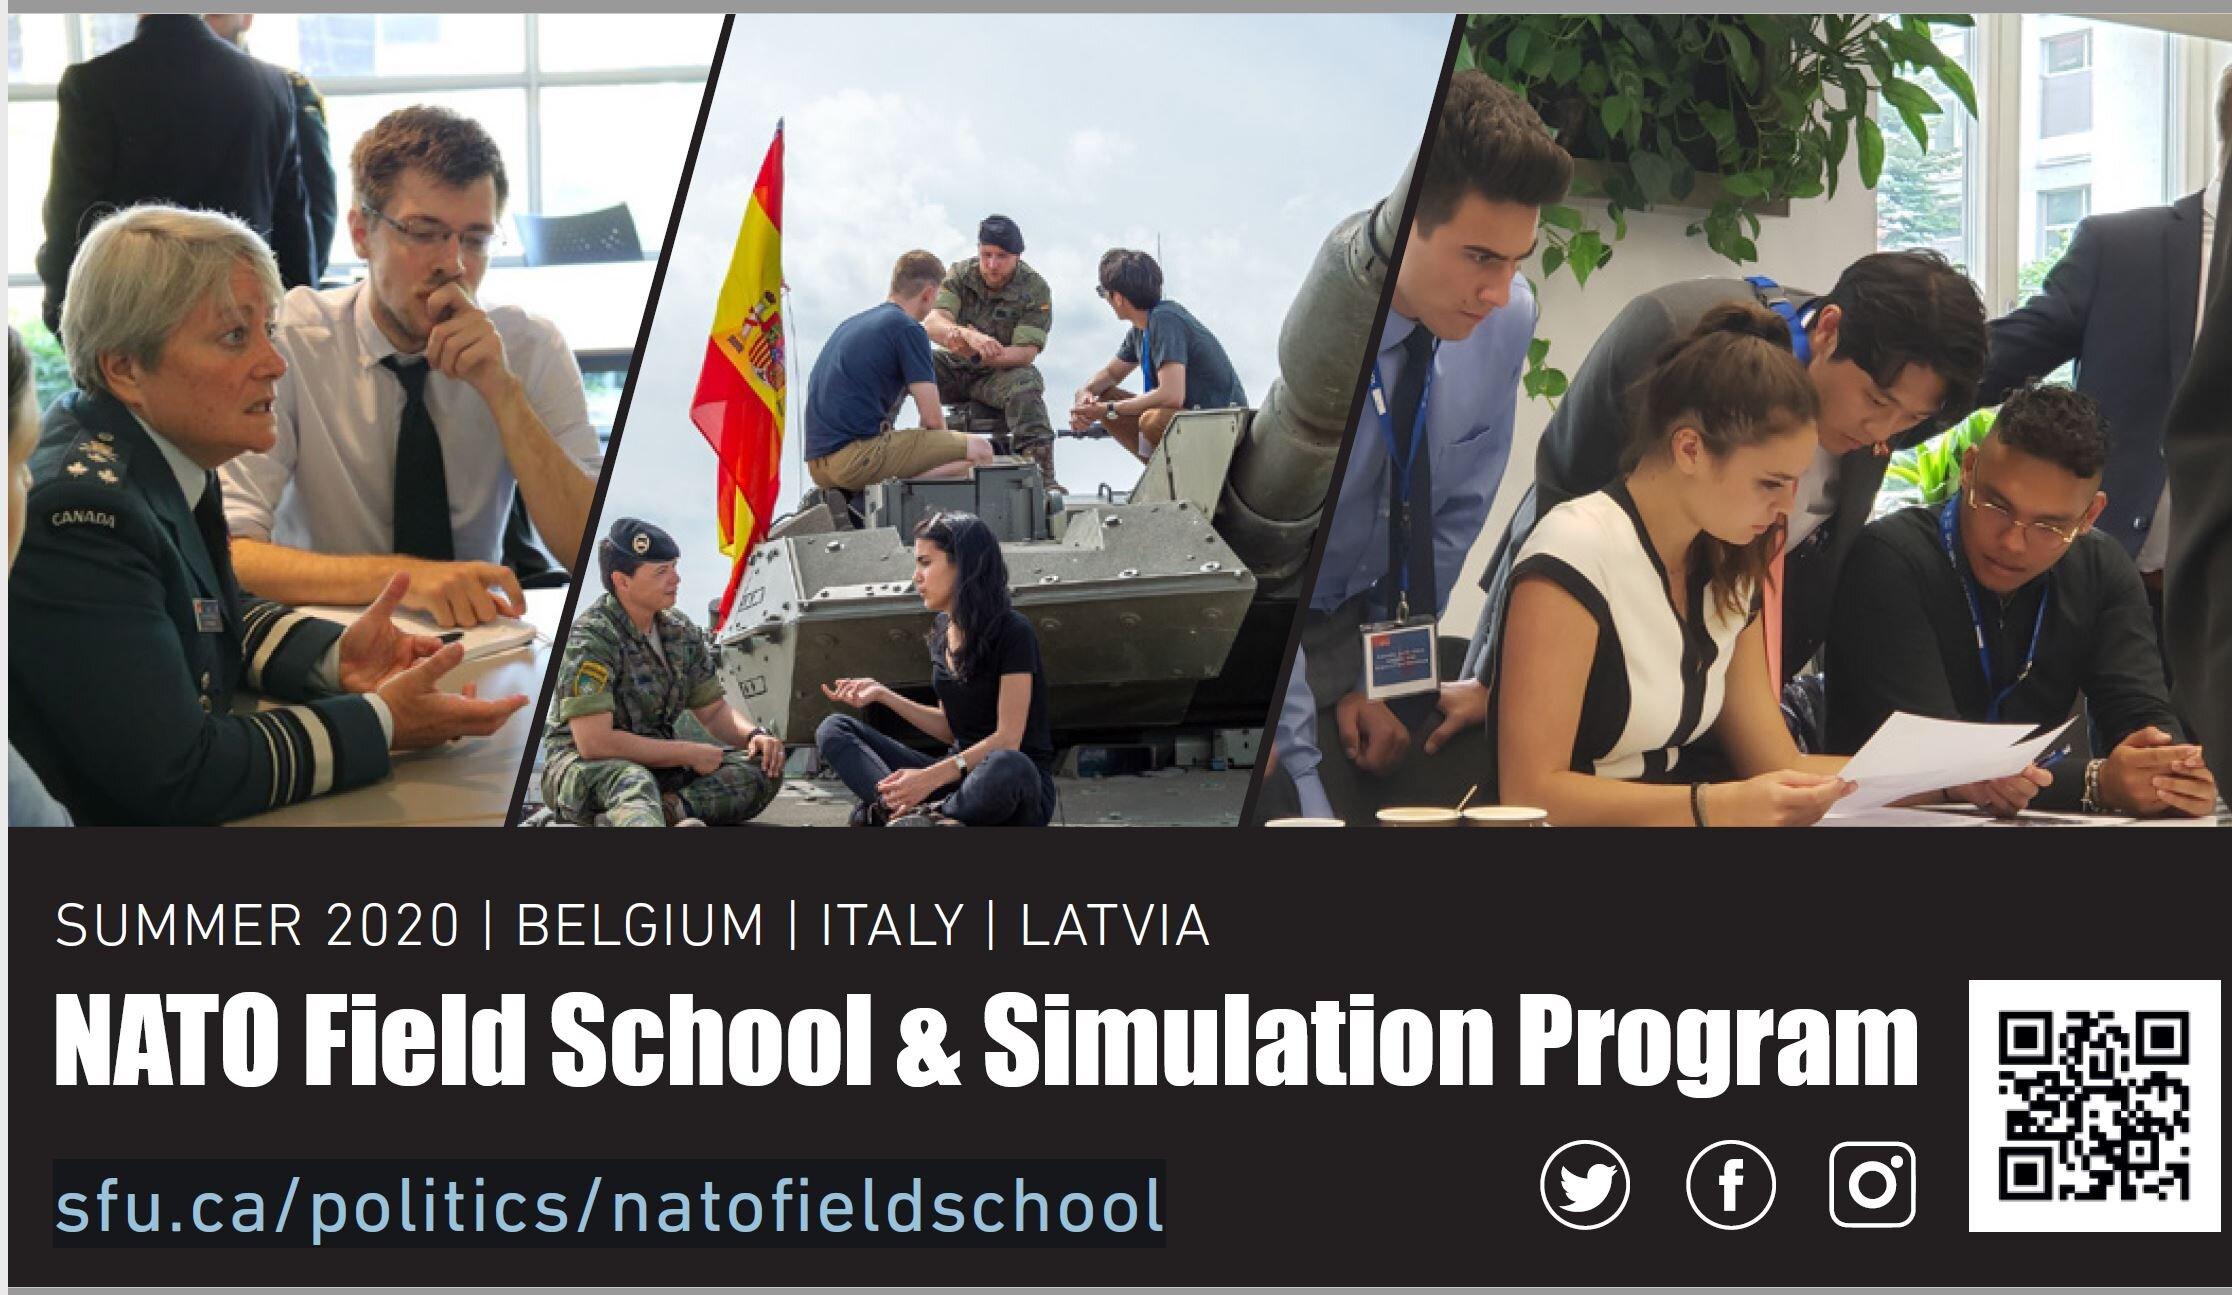 NATO field school1.JPG